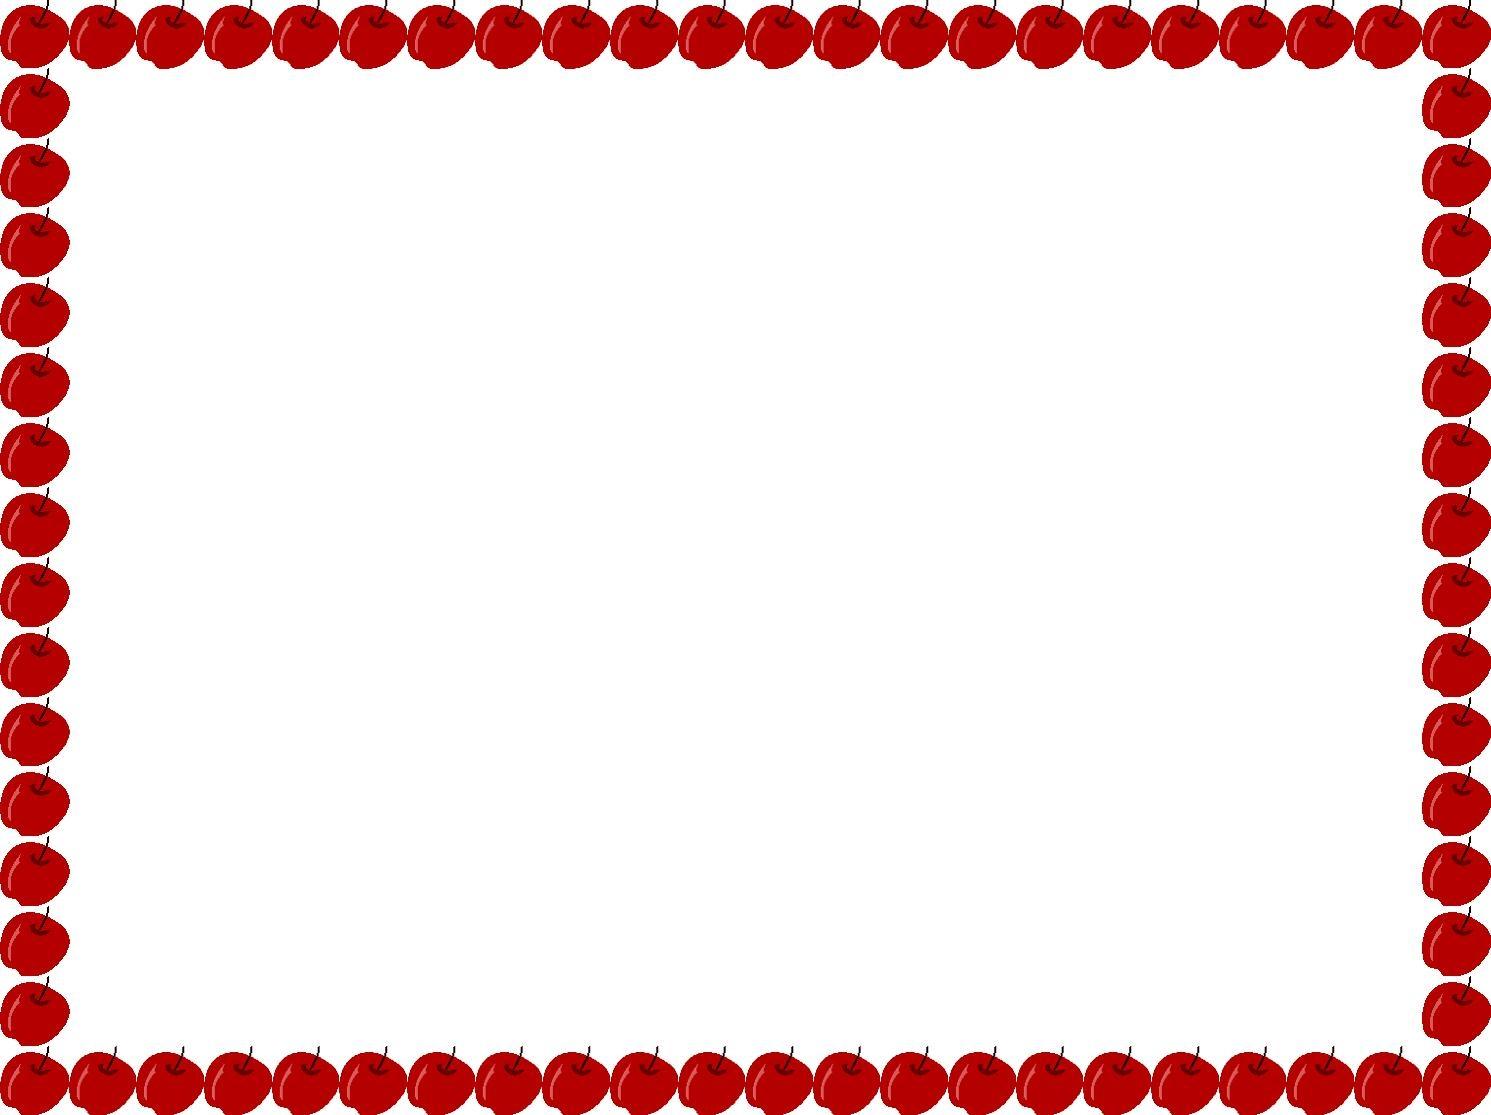 Apple preschool banner clipart svg royalty free stock Apple Border Clipart | Free download best Apple Border Clipart on ... svg royalty free stock